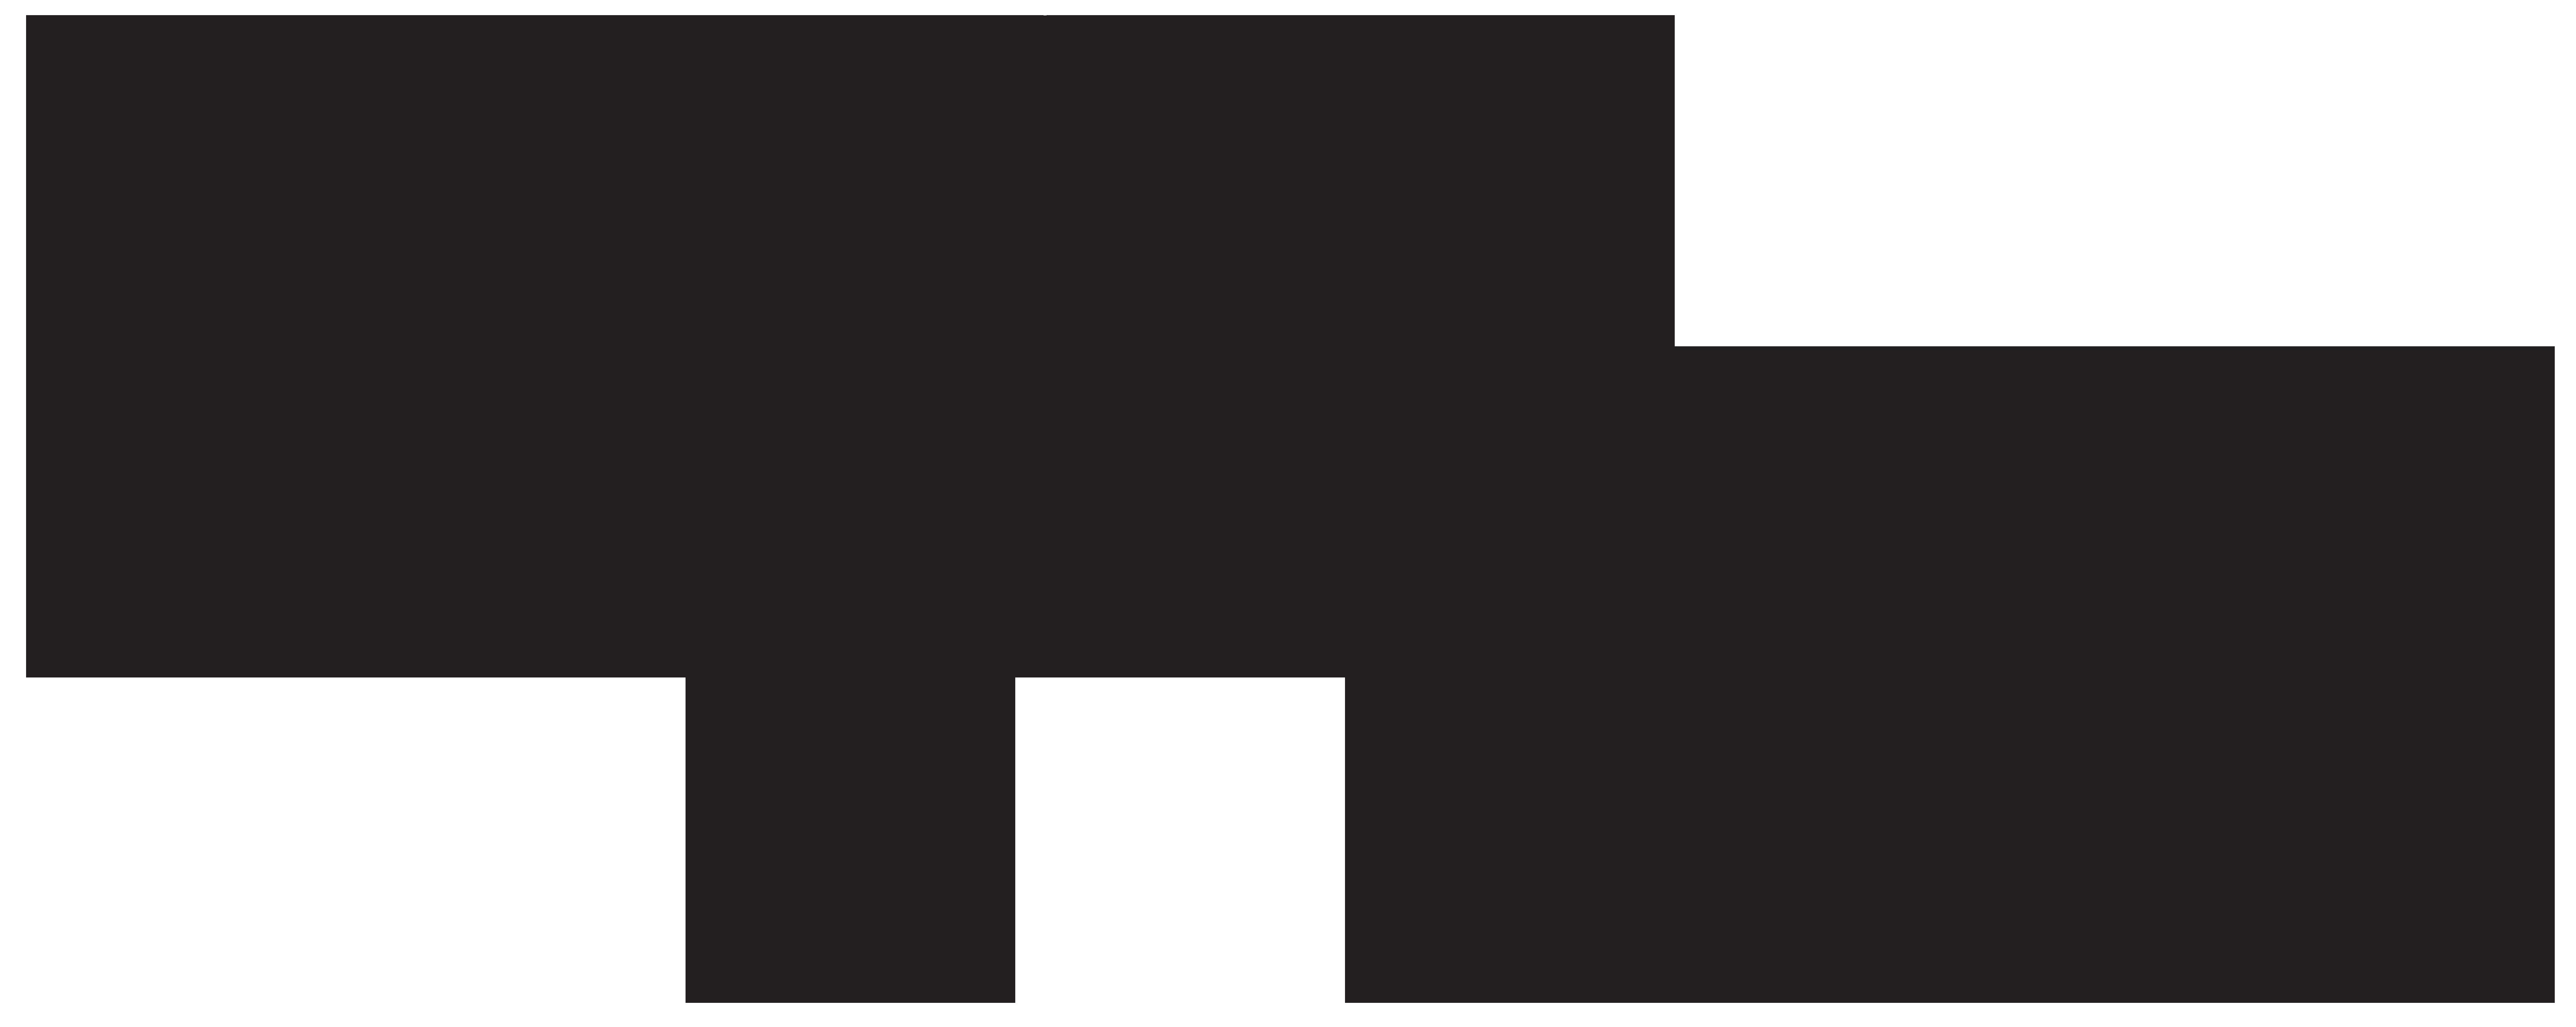 Hammerhead Shark Silhouette PNG Clip Art Image.